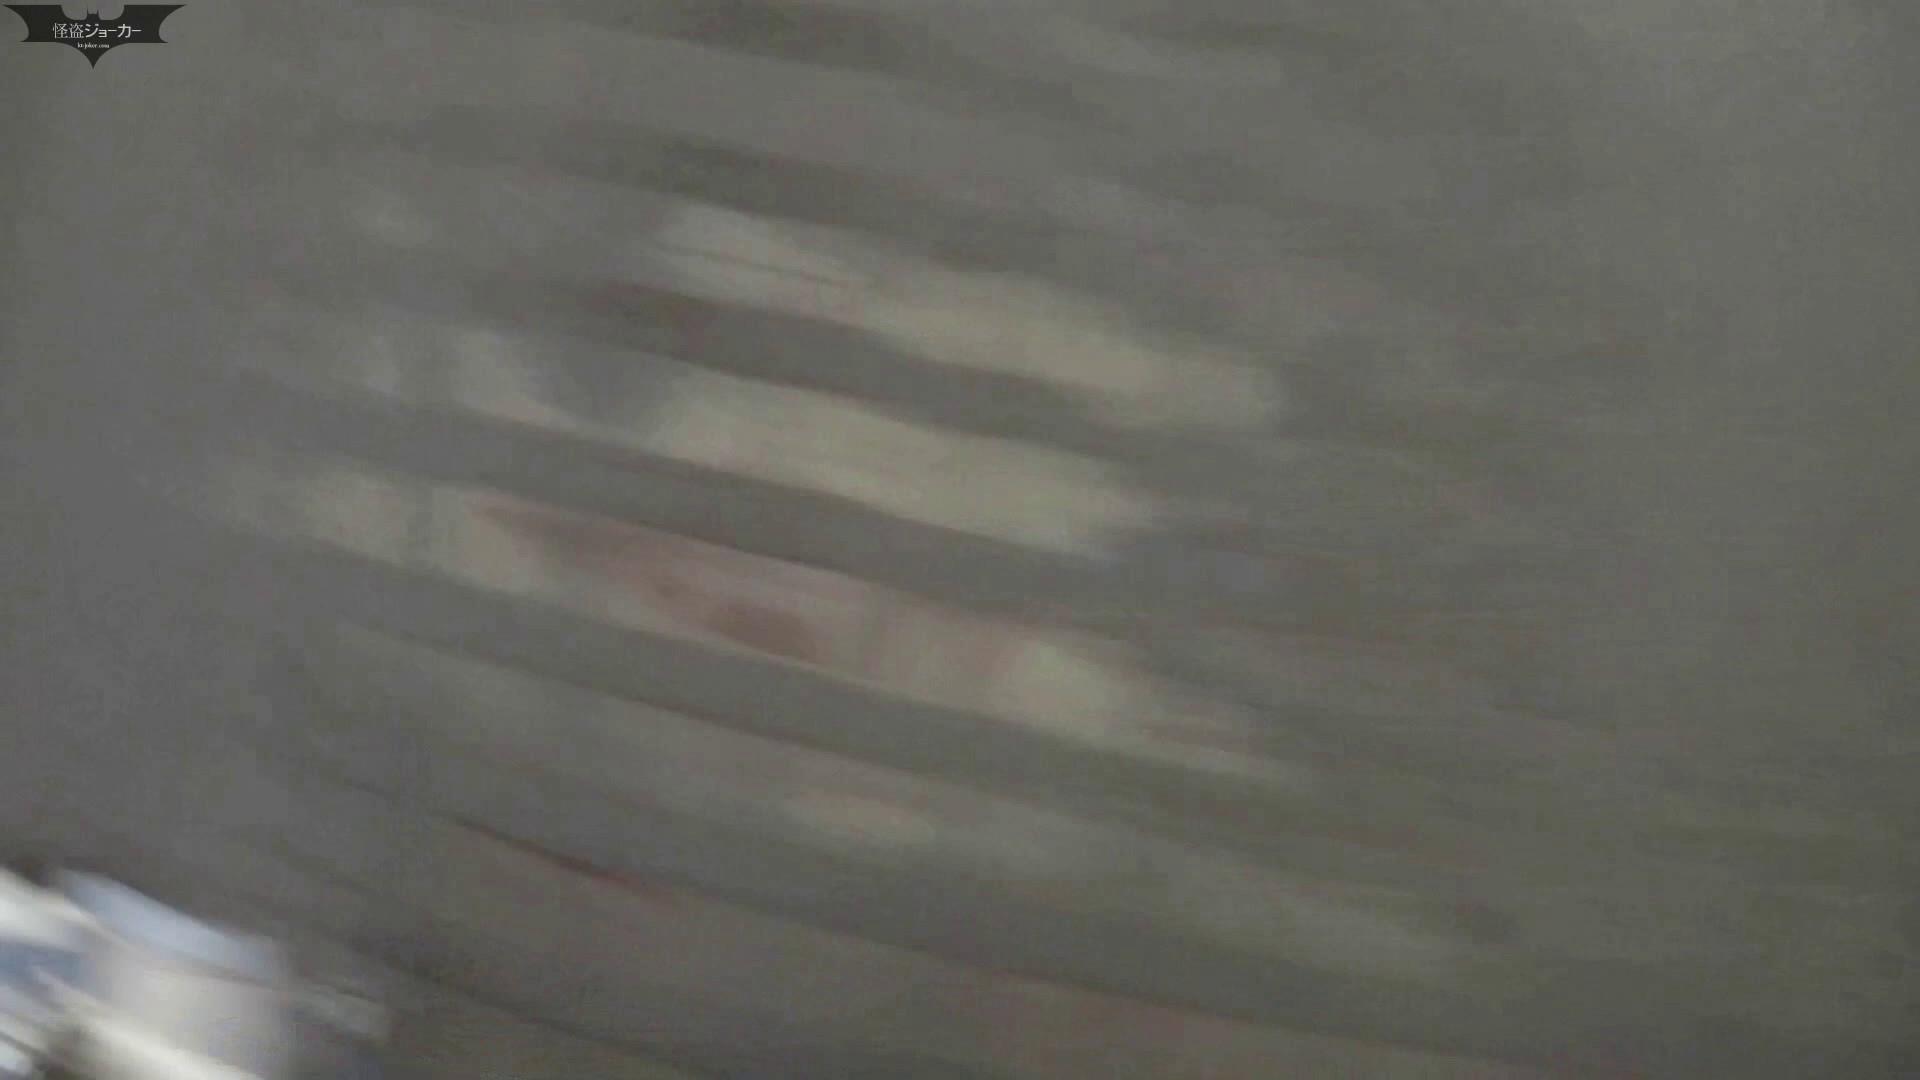 Vol.07 ワンピースの子を獲物を狩るようにくっ付いて追い撮り OL   潜入エロ調査  56連発 13